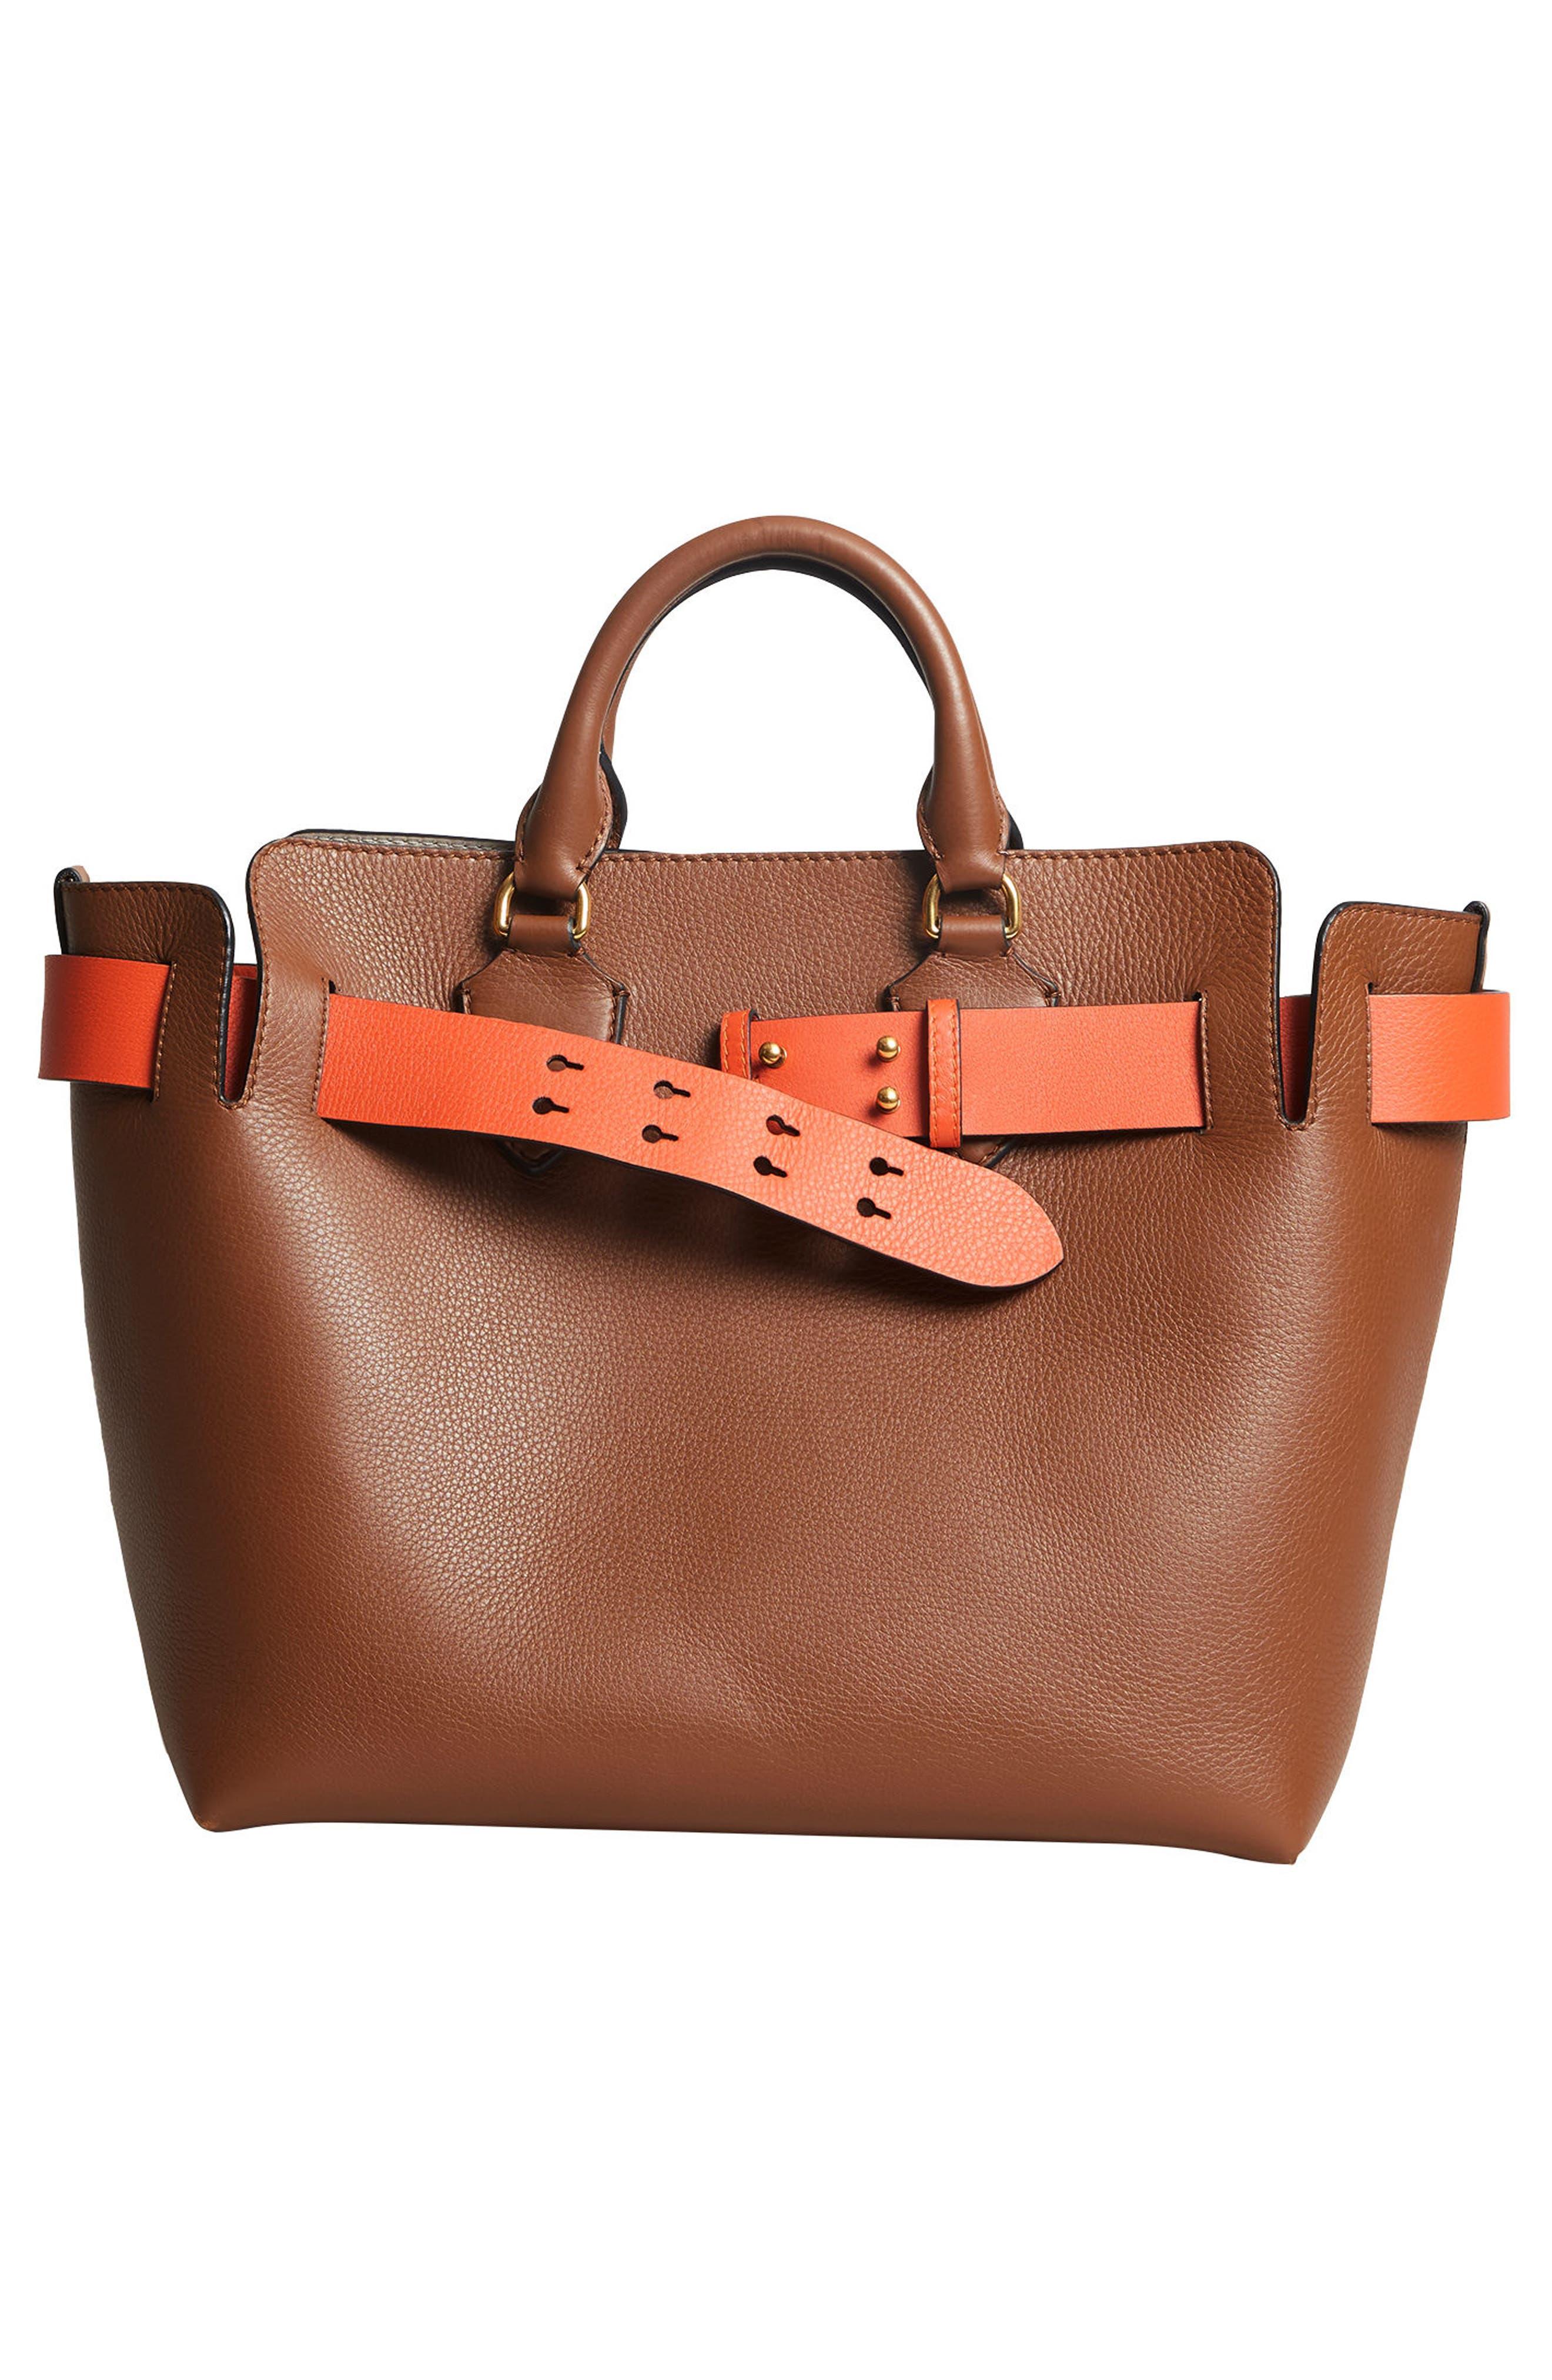 Medium Belt Bag Leather Tote,                             Alternate thumbnail 2, color,                             216